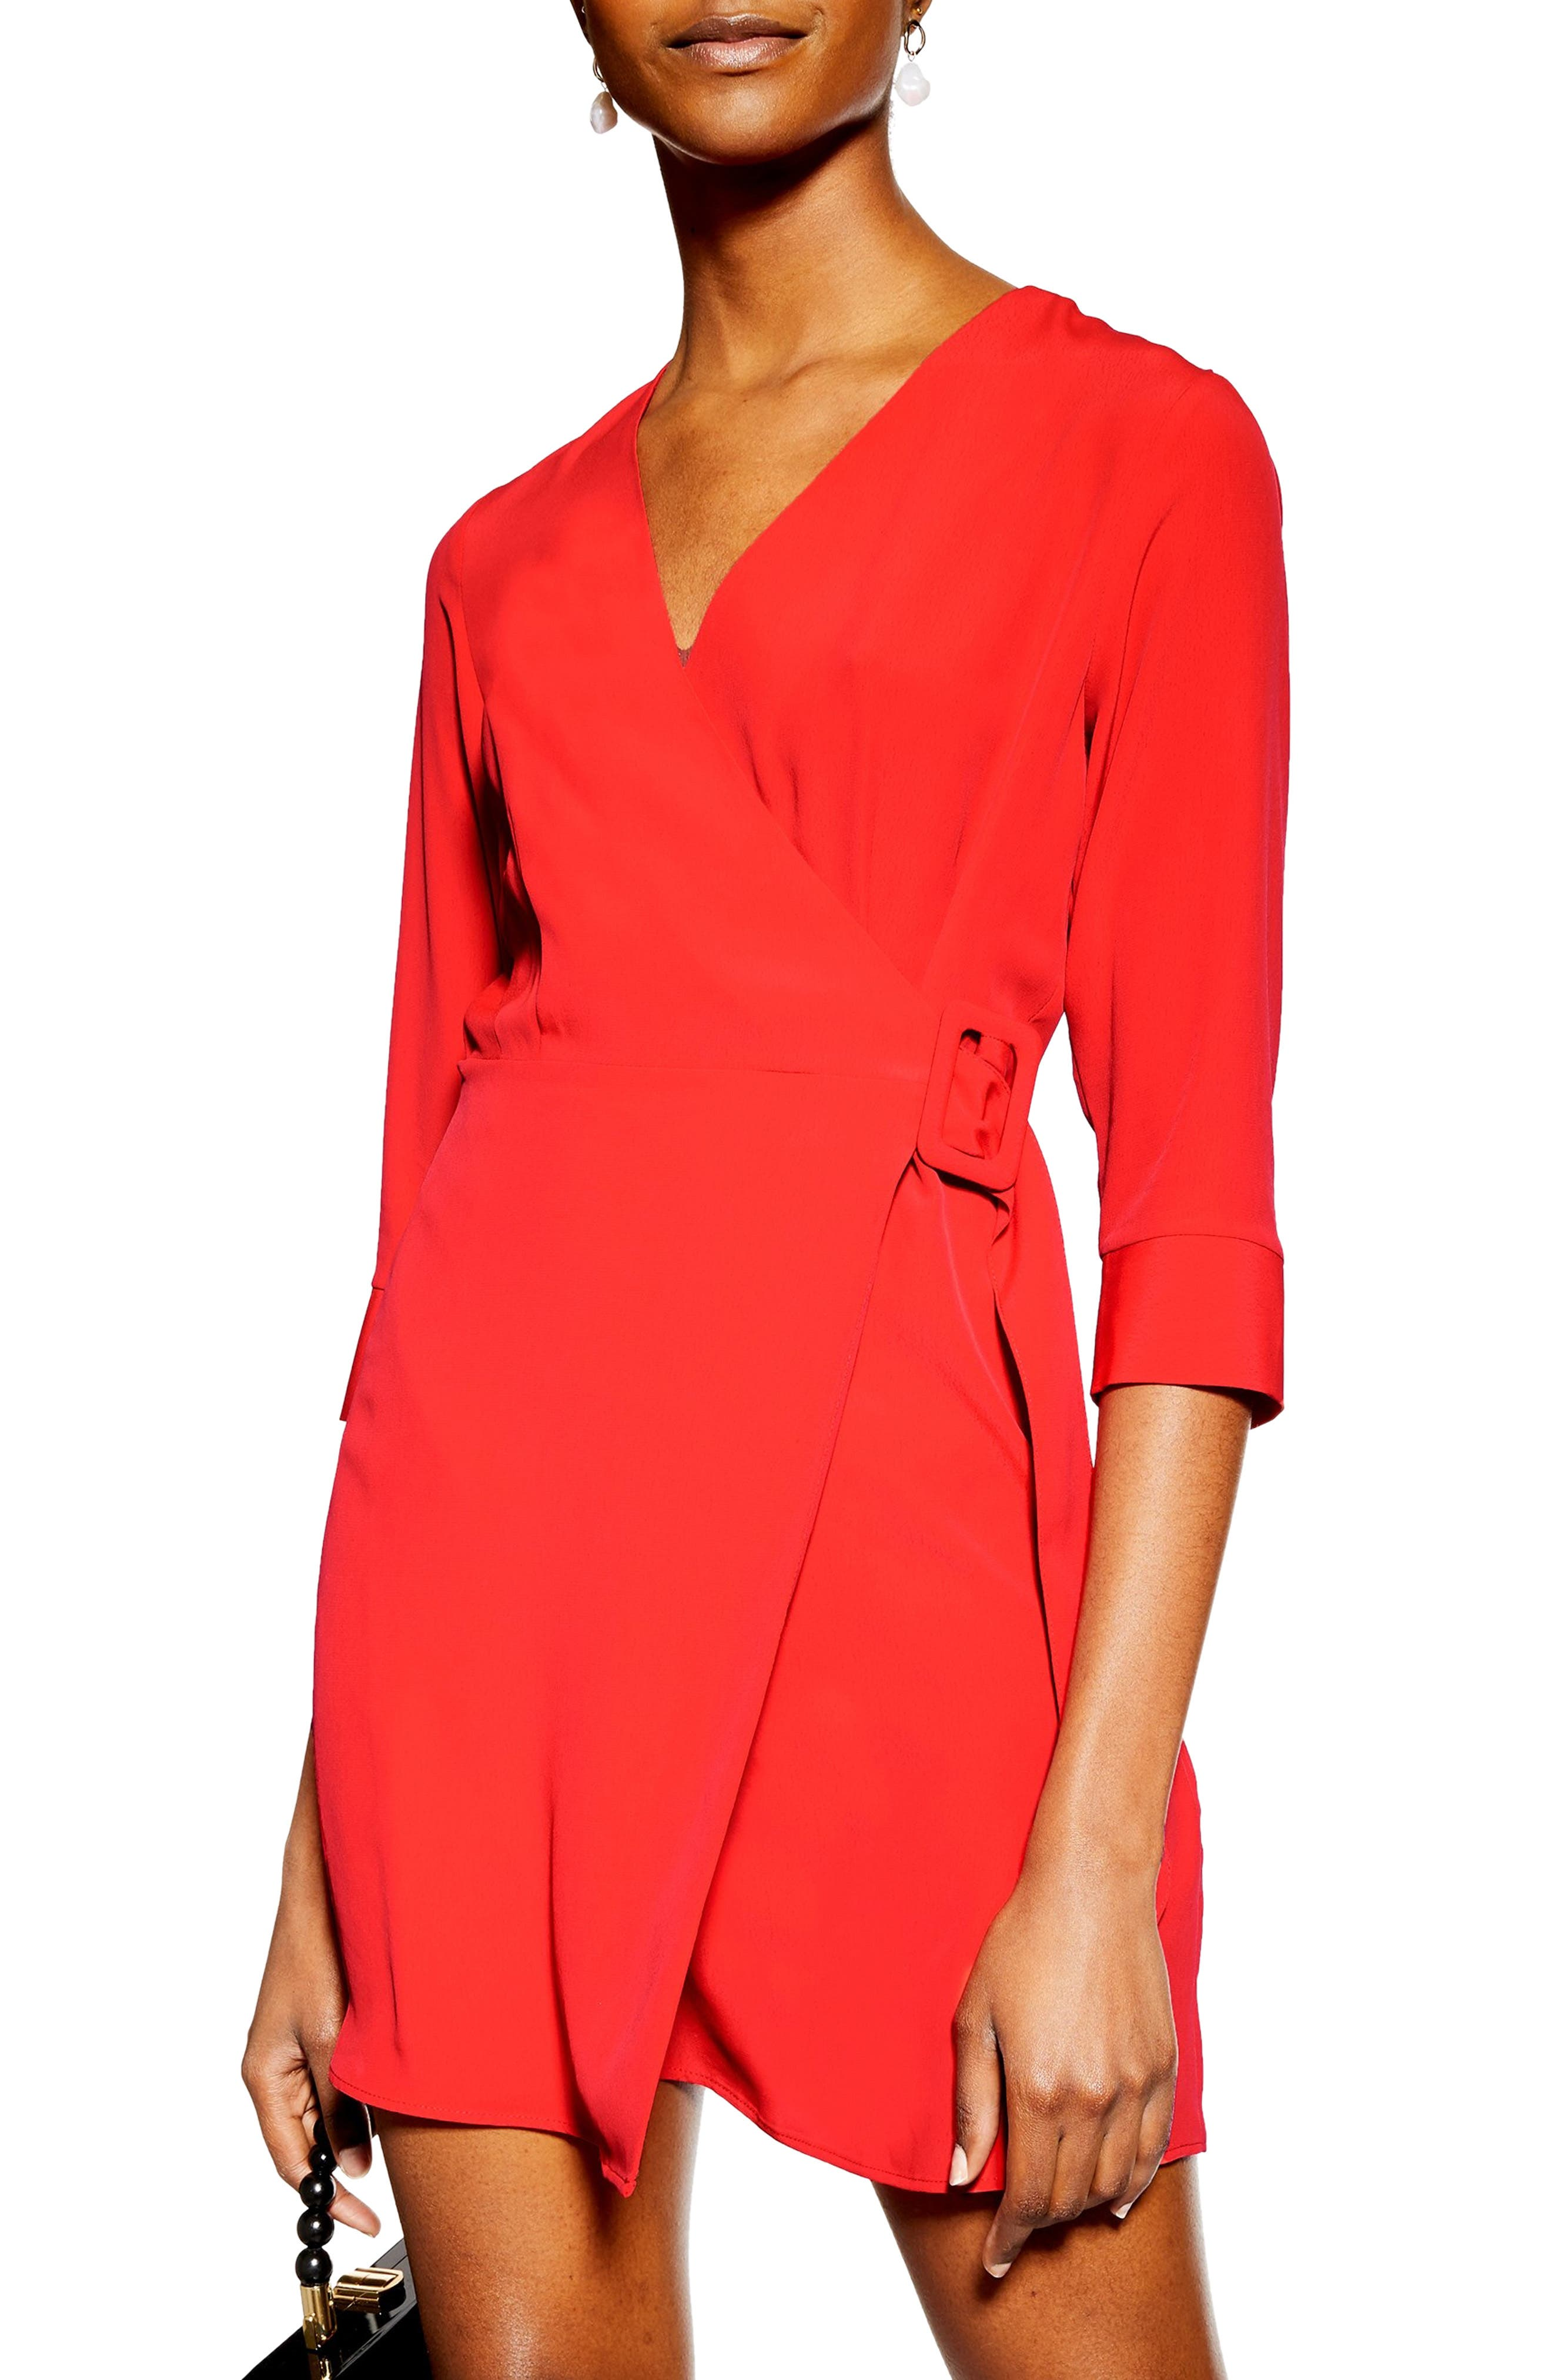 Topshop Wrap Minidress, US (fits like 0-2) - Red